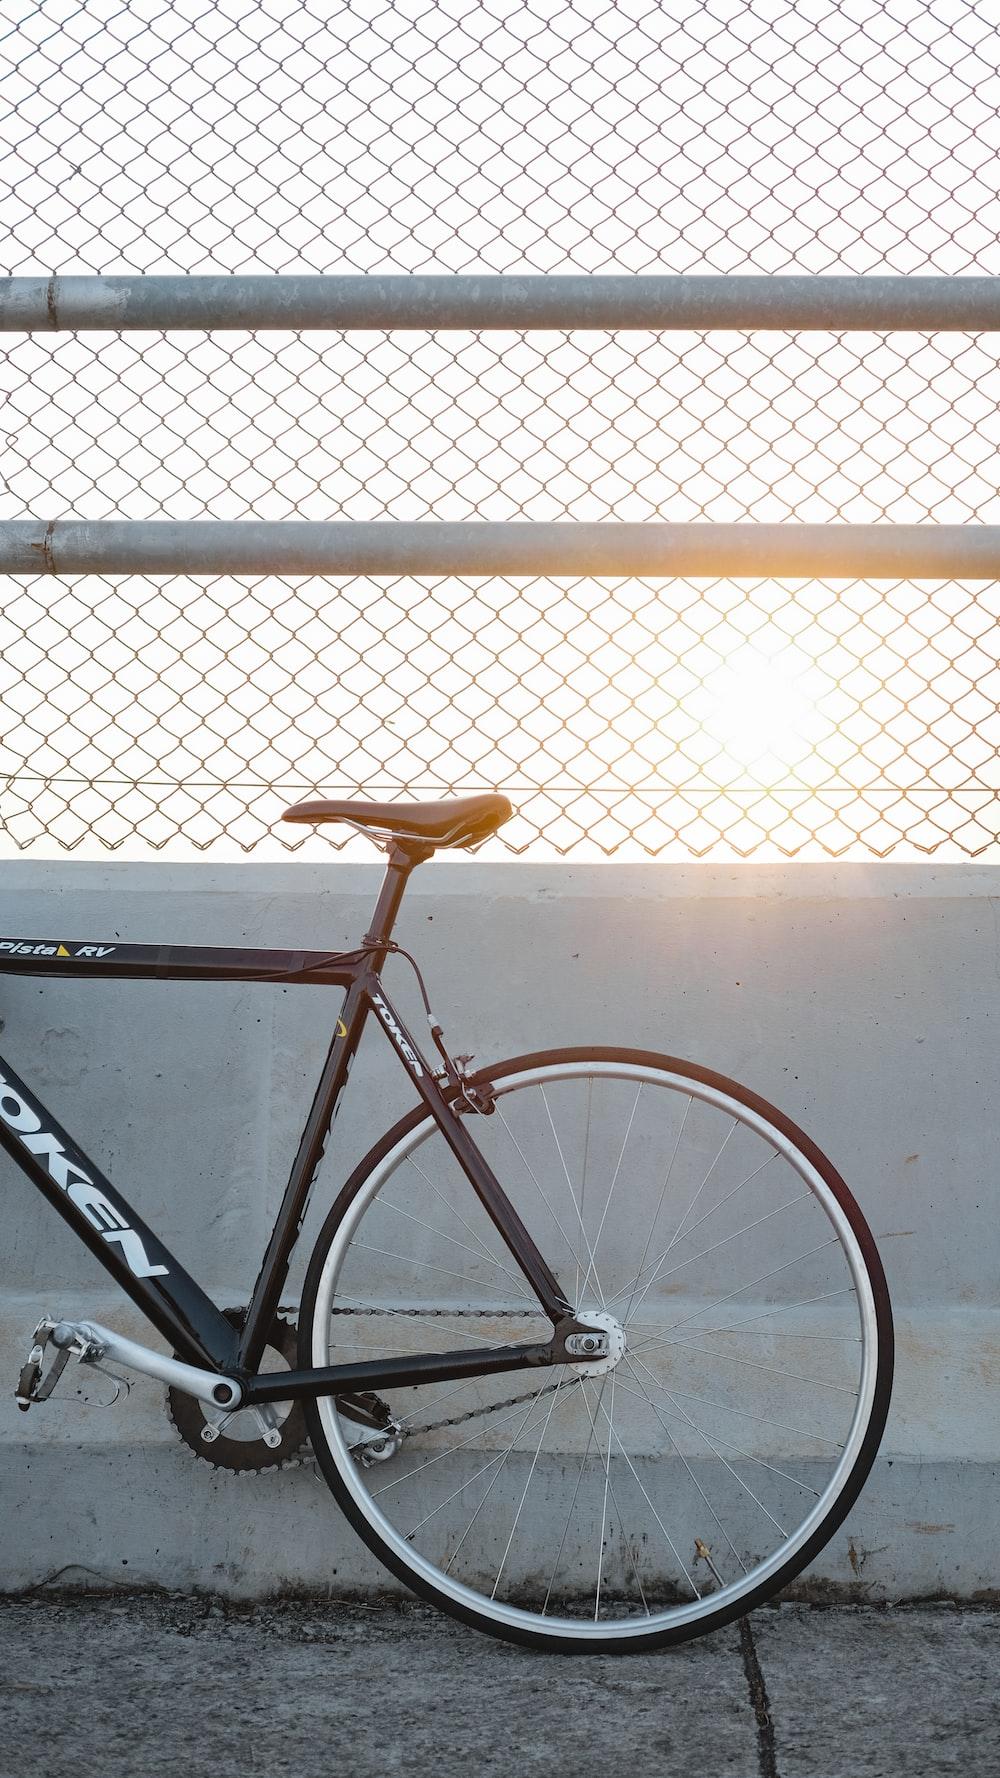 orange and black road bike leaning on white metal fence